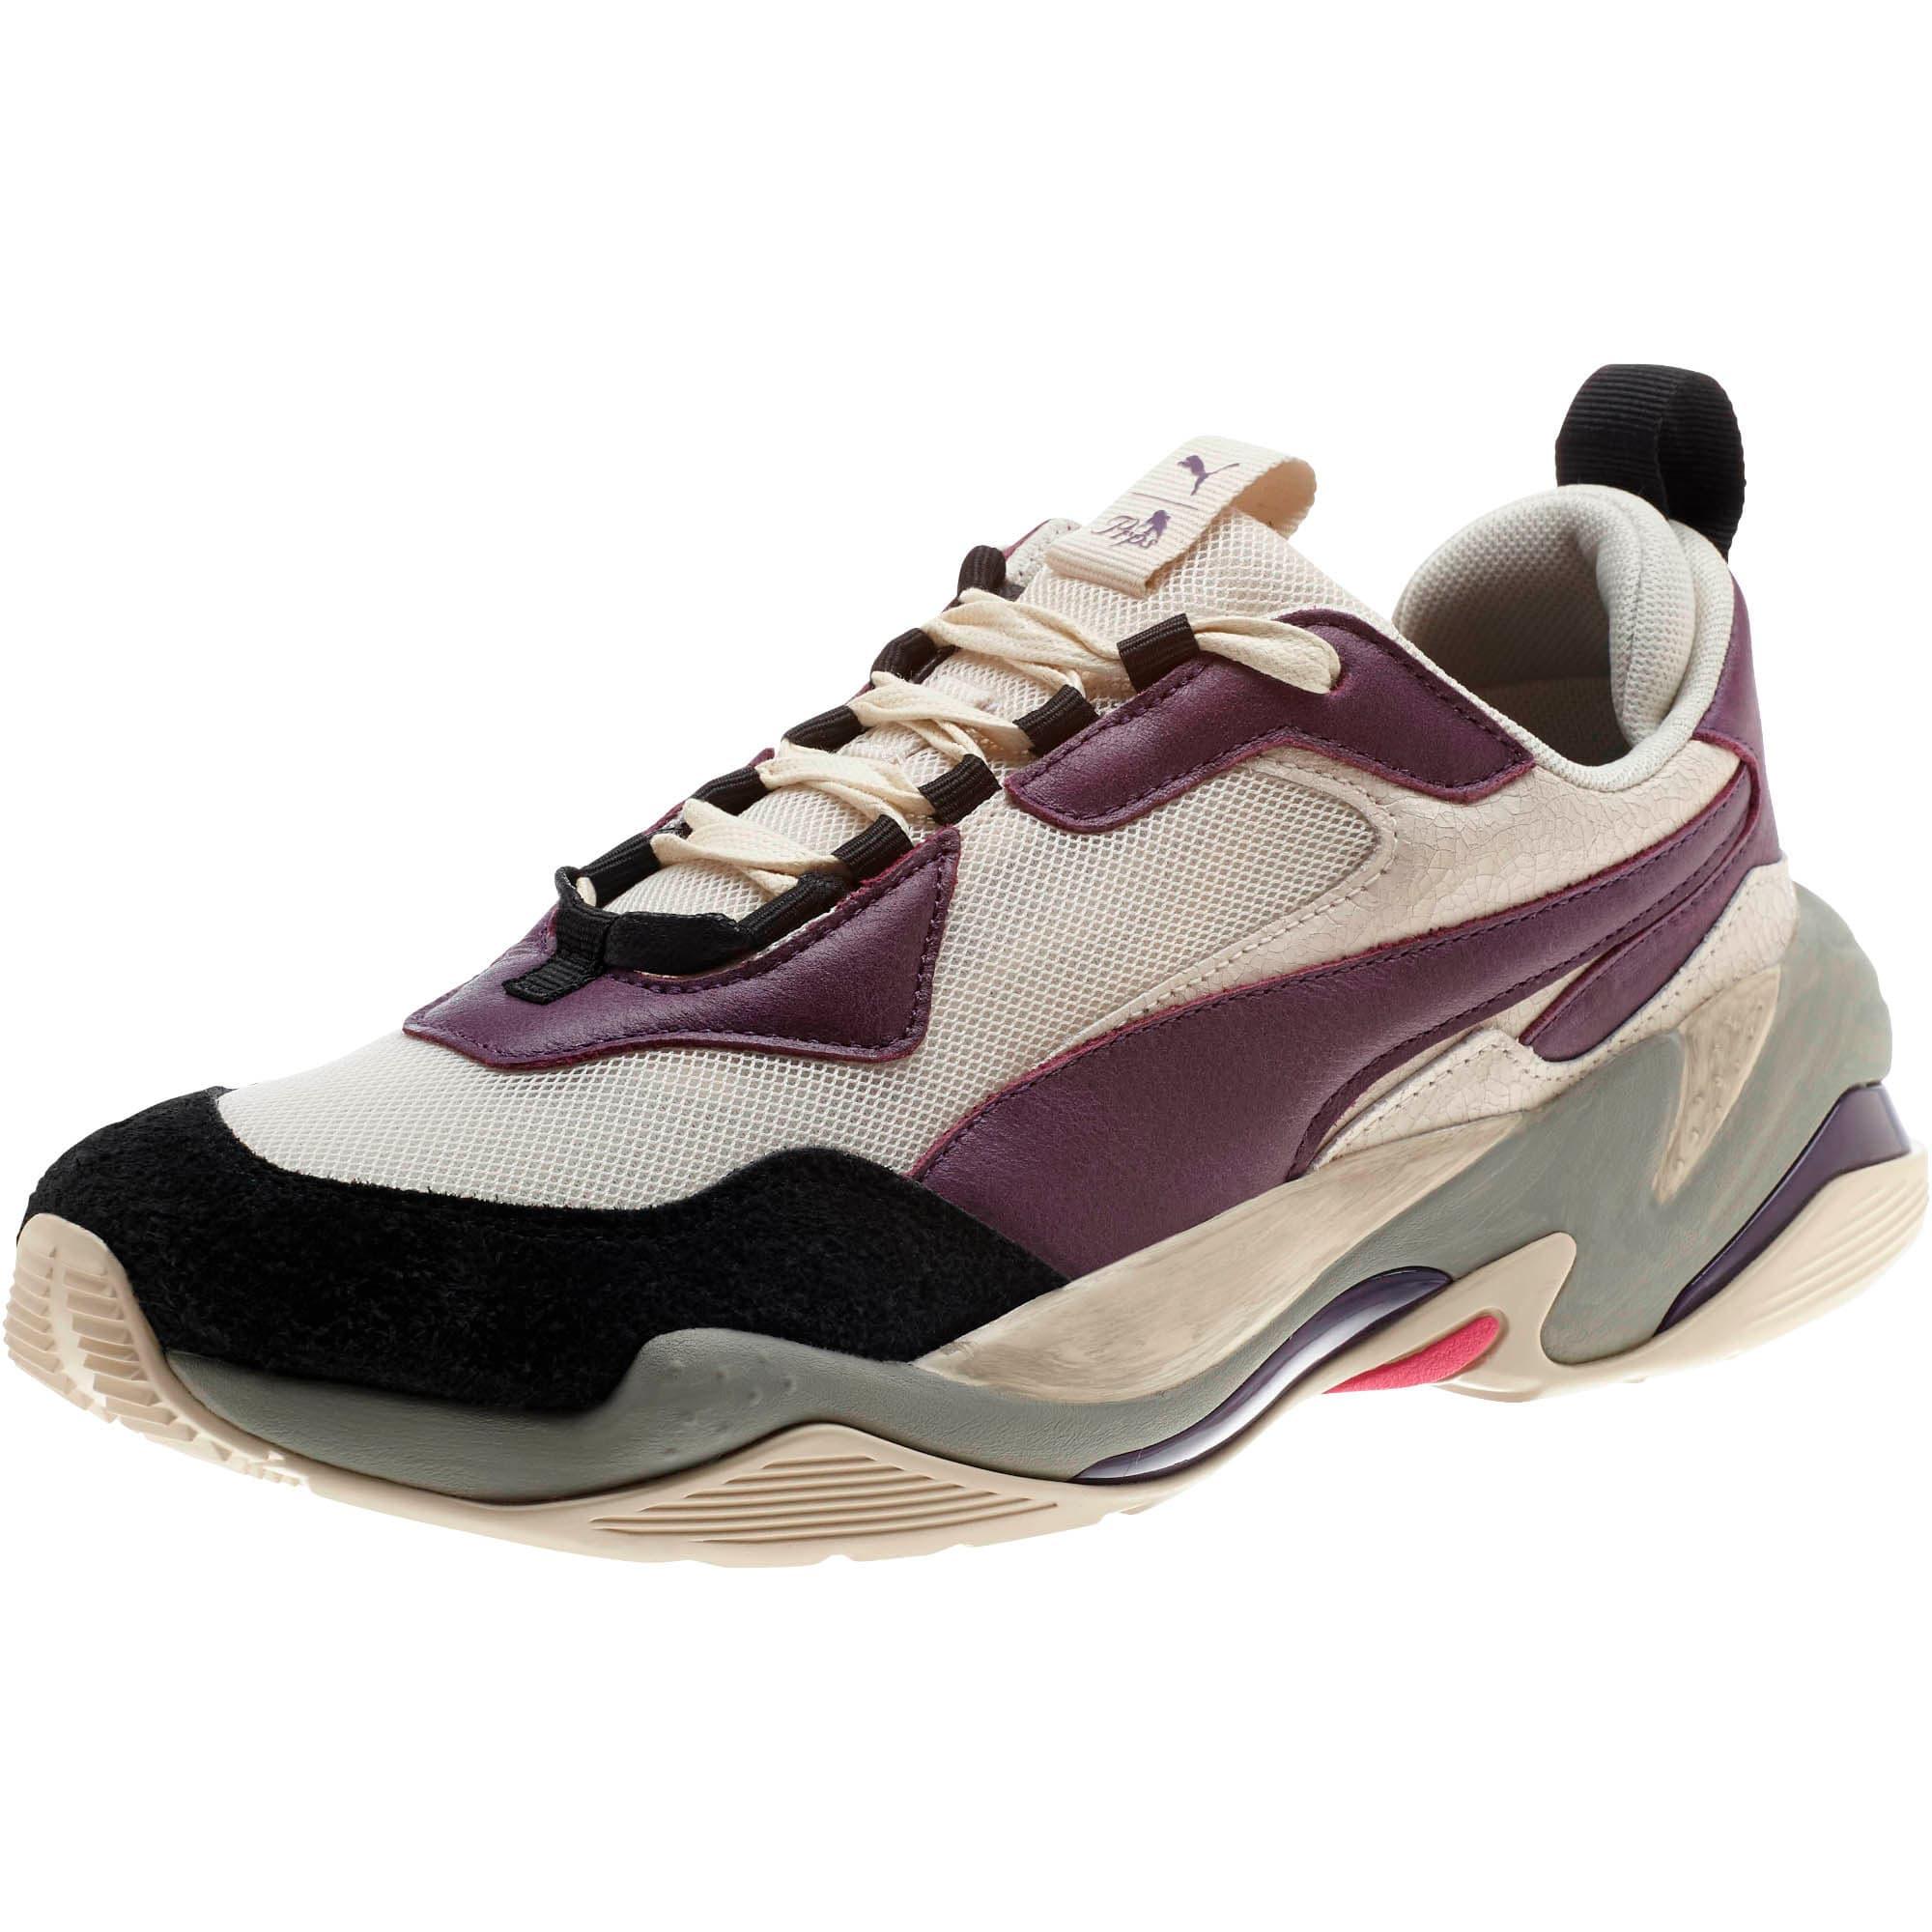 Thumbnail 1 of Thunder x PRPS Sneakers, Birch- Black-Indigo, medium